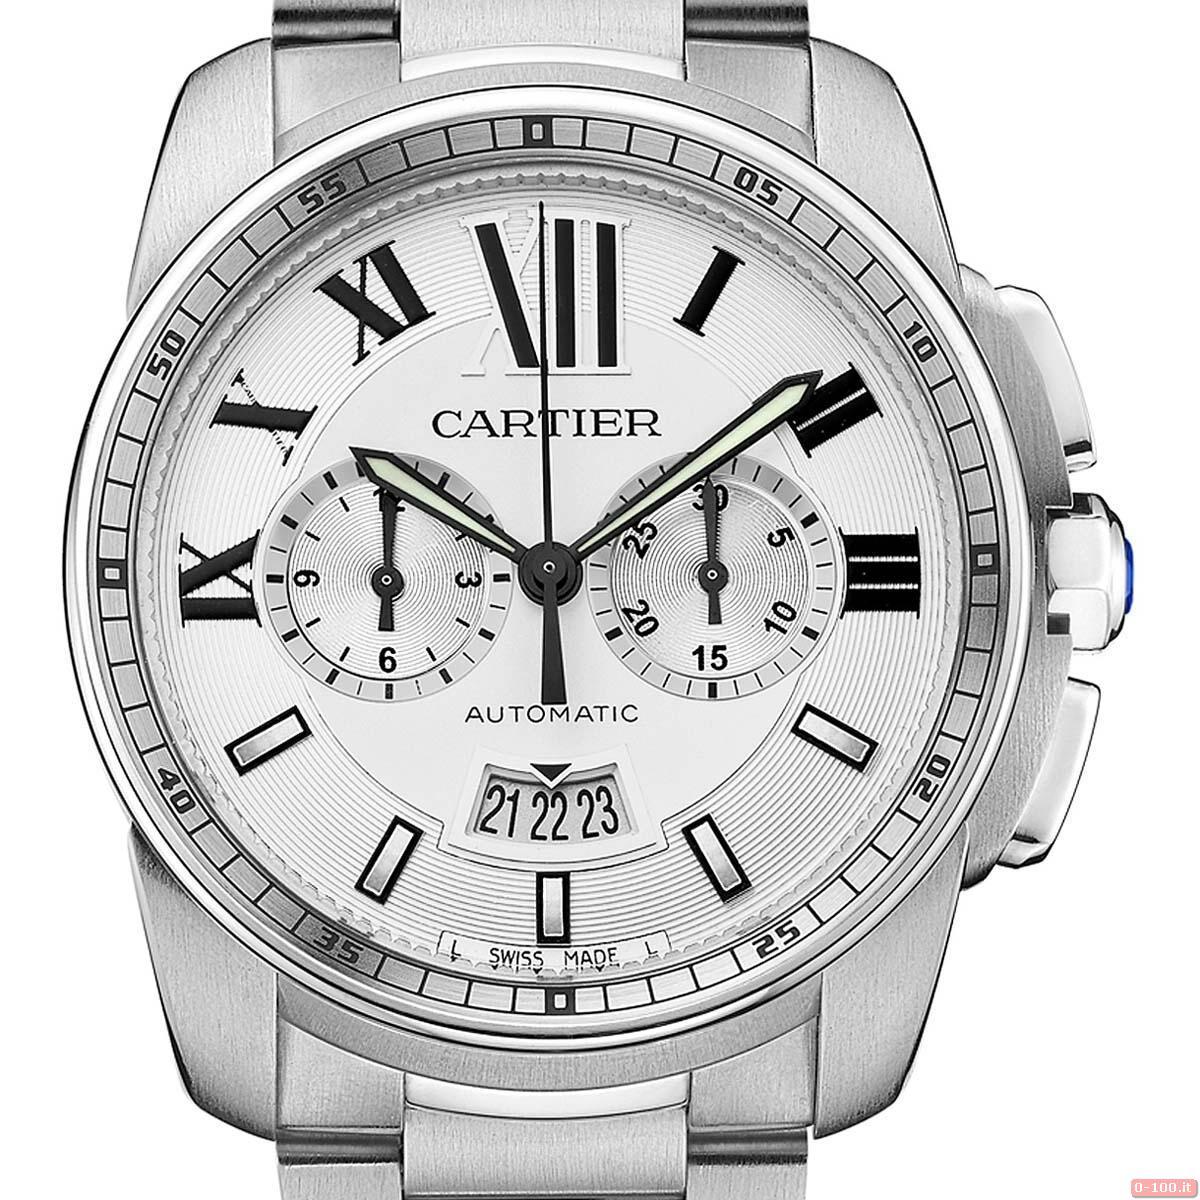 Cartier Calibre Chronograph Watch _0-1005